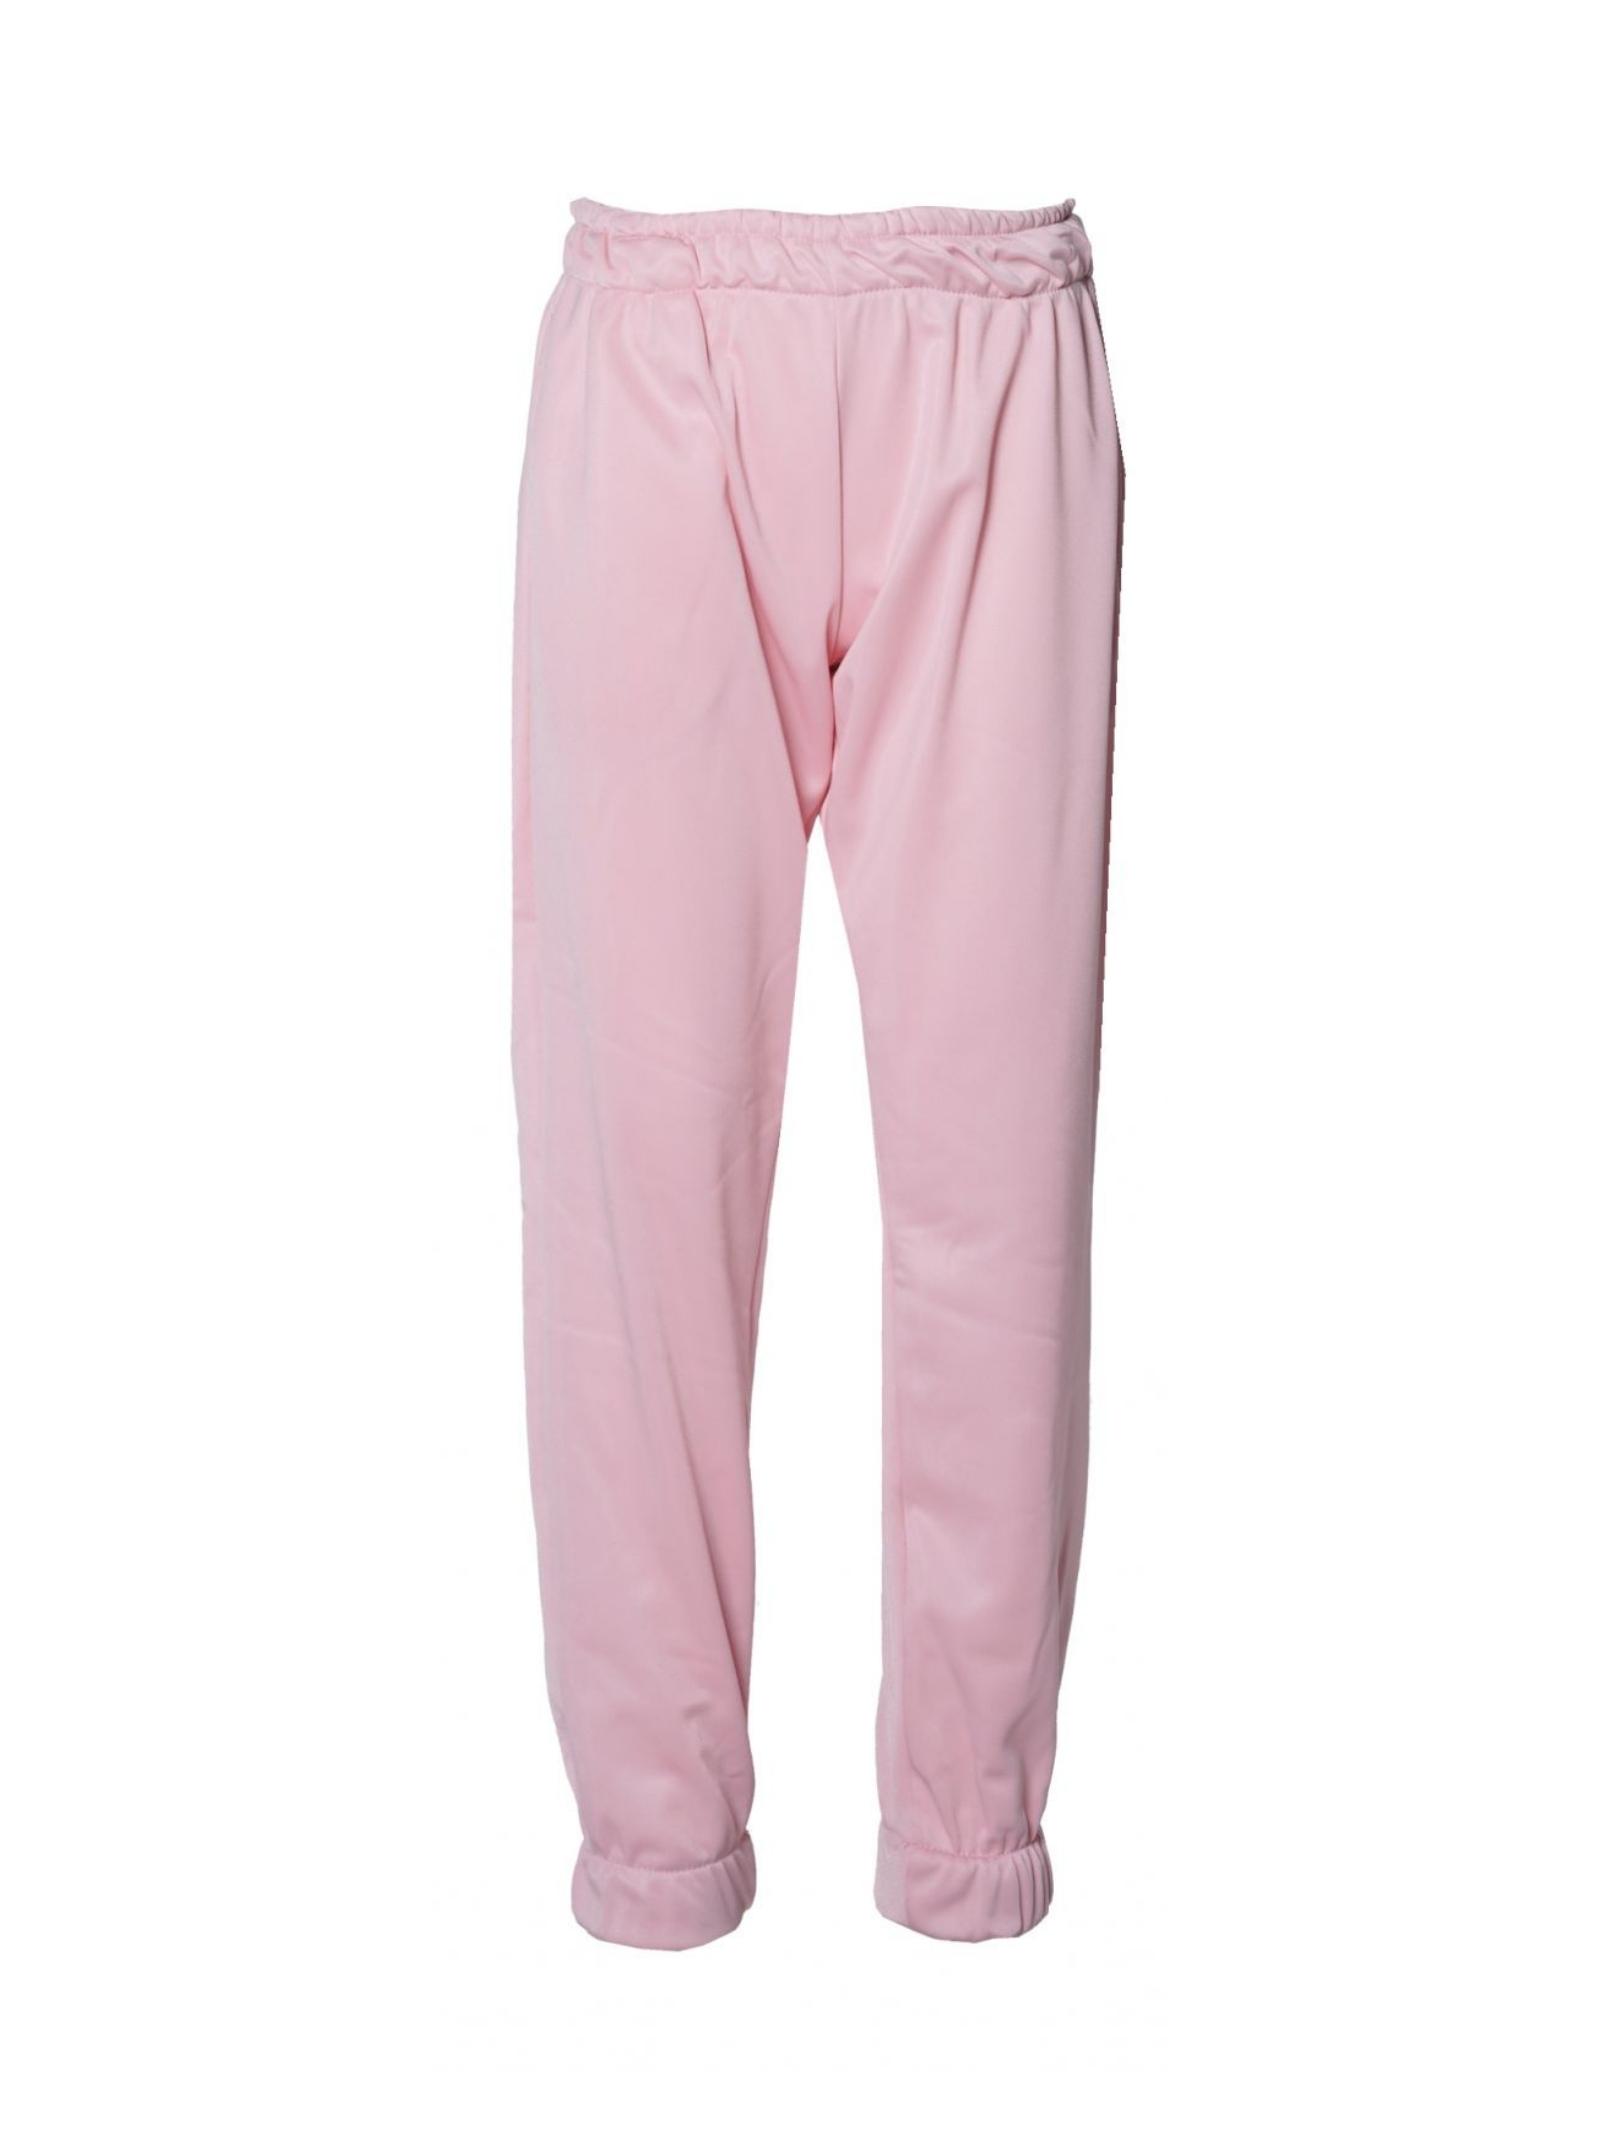 Pantatuta Pink Bambina FUN&FUN | Pantaloni | FNJPT8996ROSA